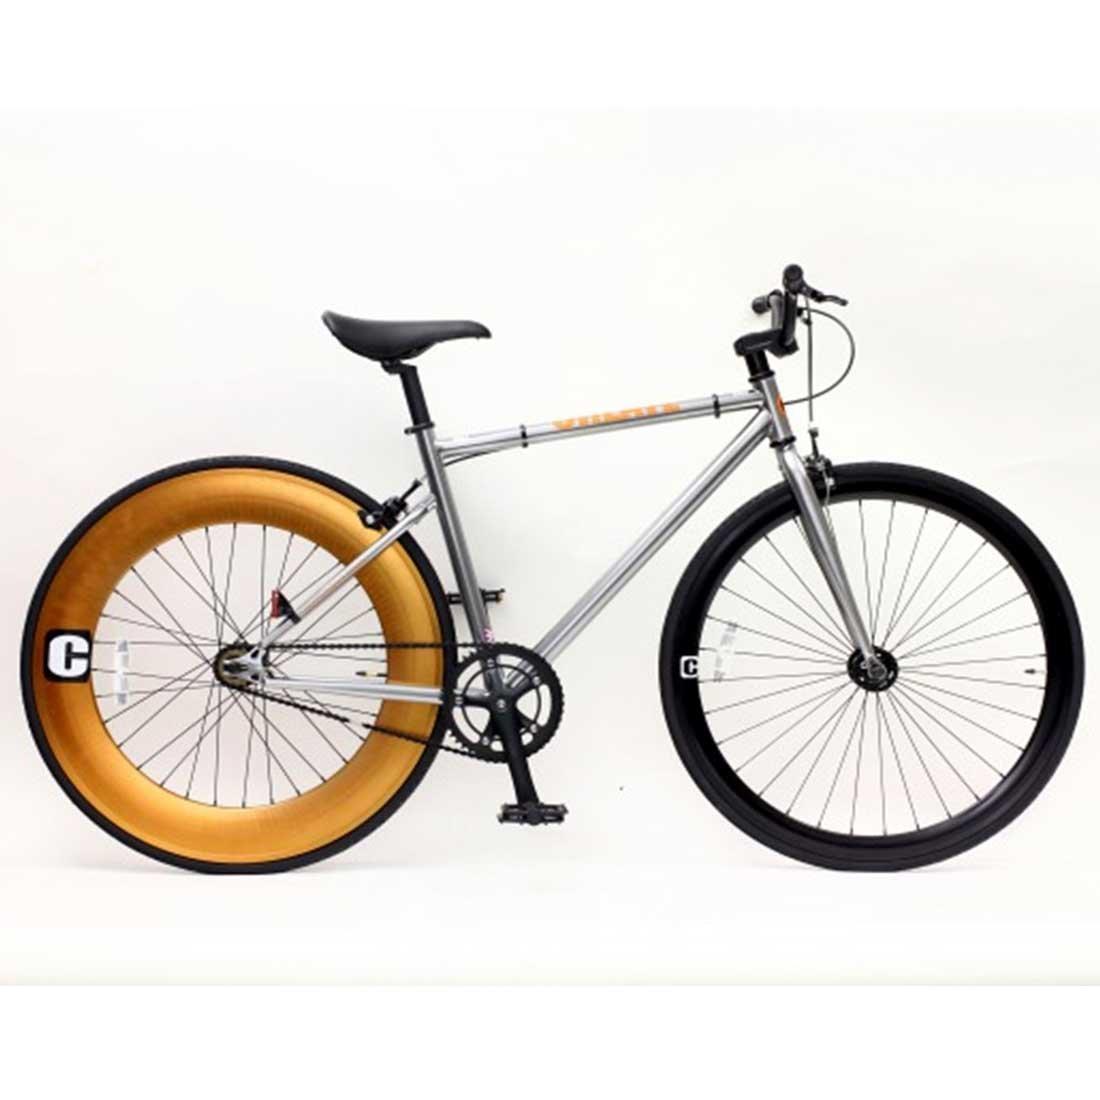 【CREATE BIKES Single-PisteBike】 ストリートピストバイク  湘南鵠沼海岸発信 B0765STLCH 460mm(160cm~)|シルバー シルバー 460mm(160cm~)